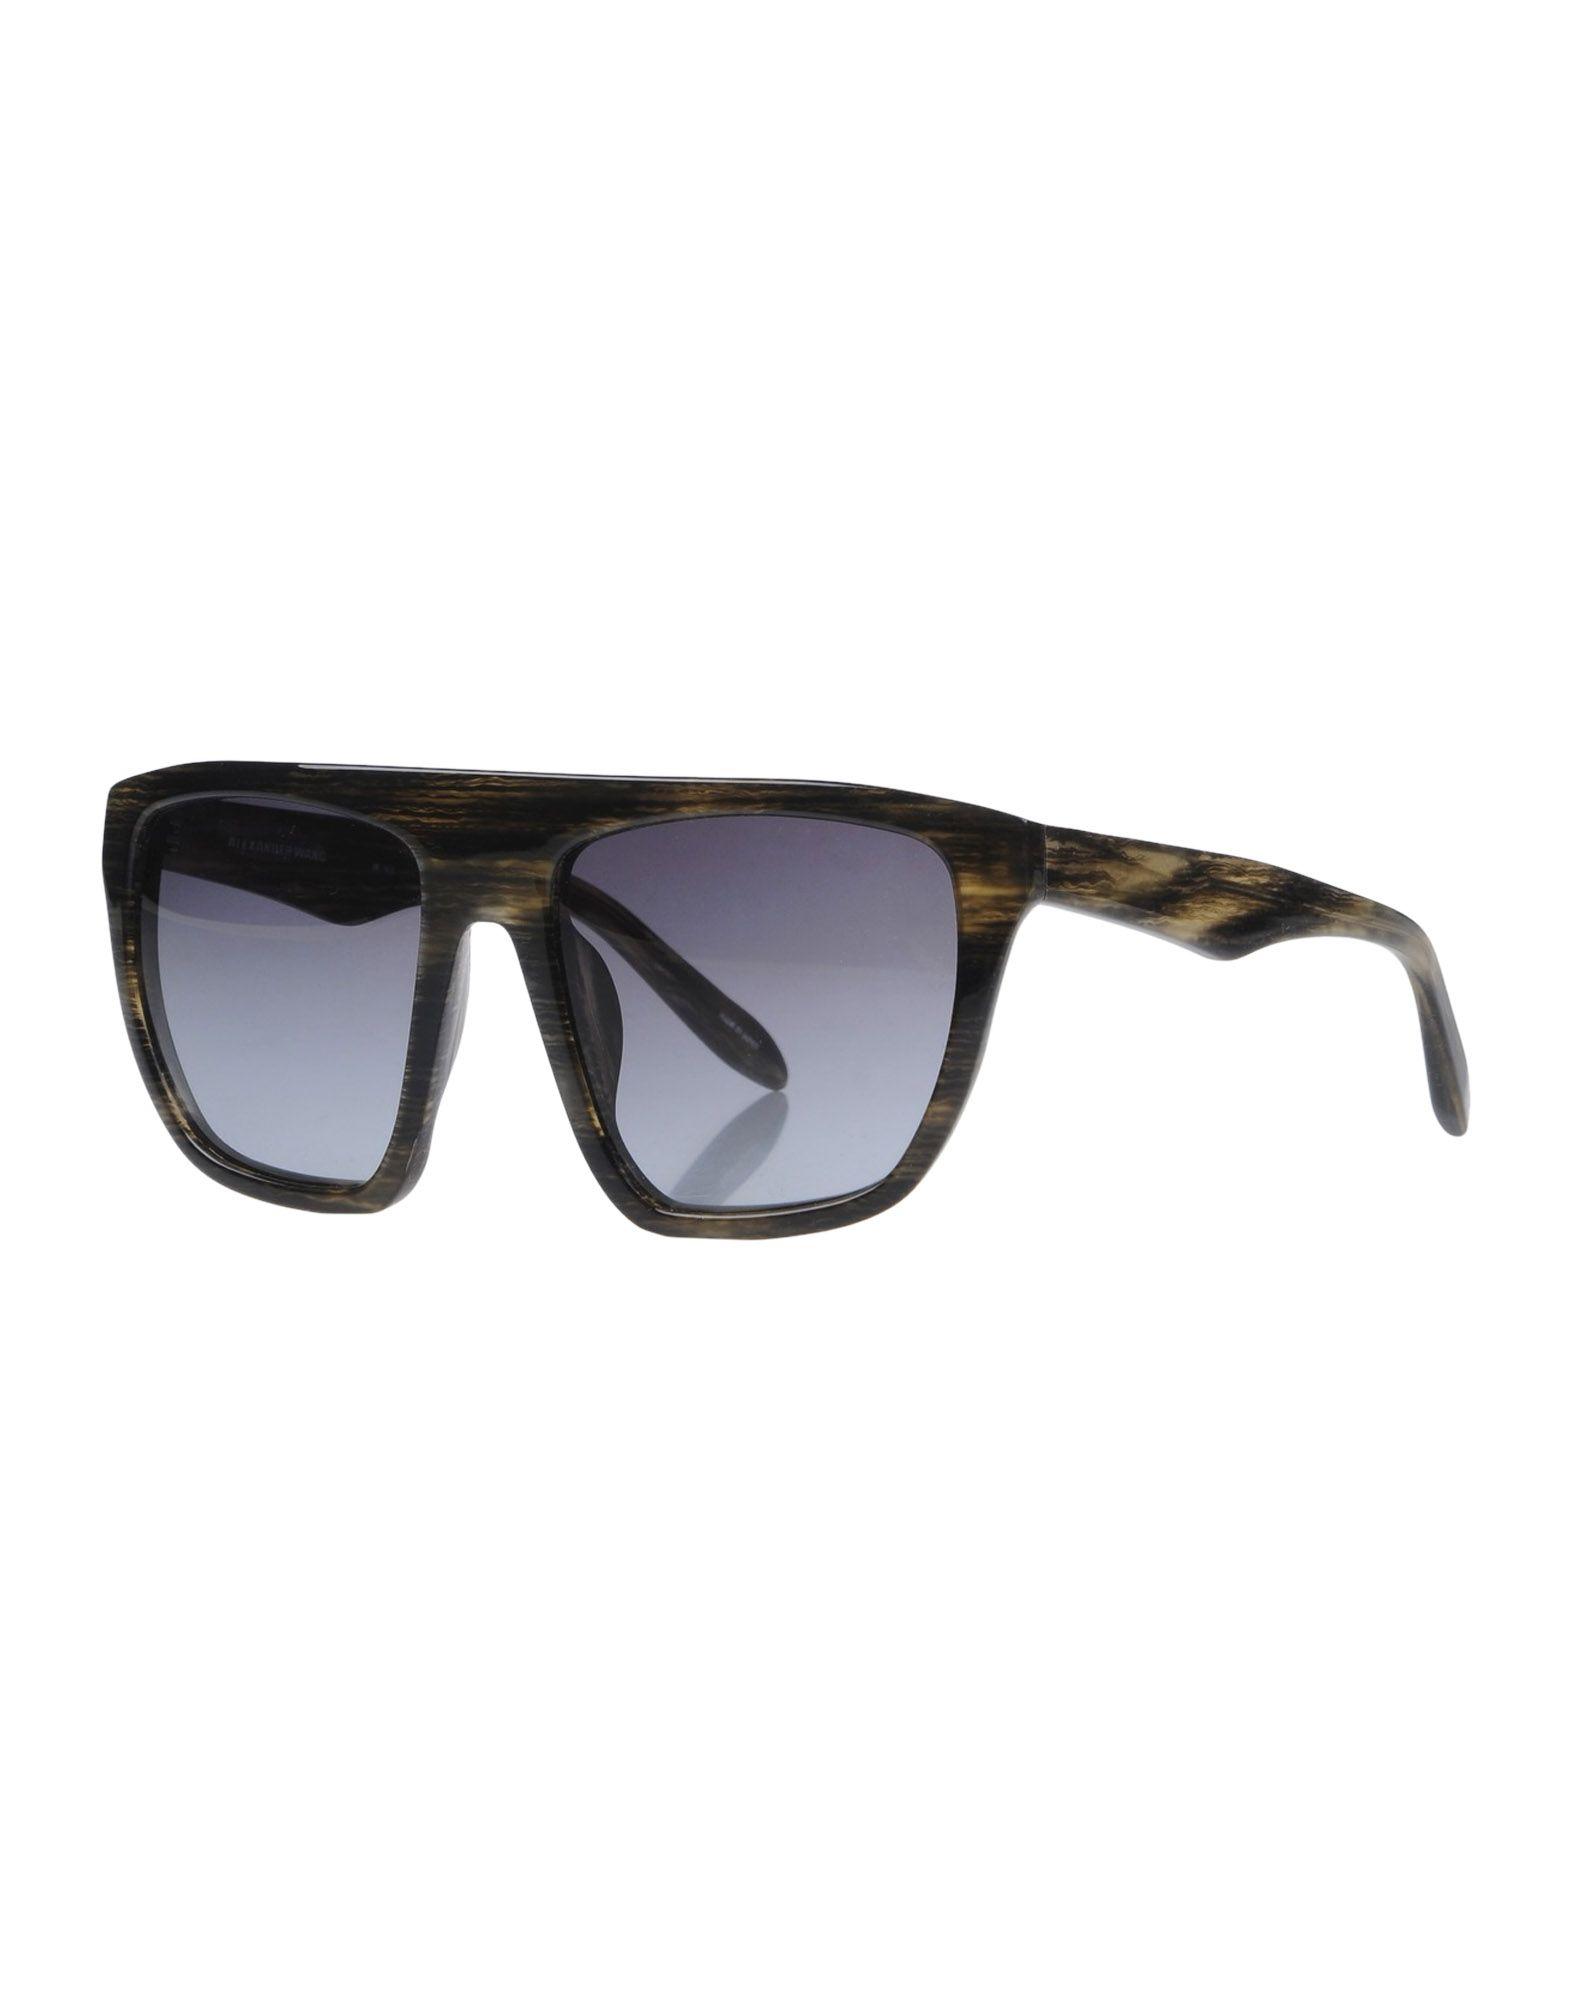 ALEXANDER WANG BY LINDA FARROW Солнечные очки linda farrow with matthew williamson солнечные очки